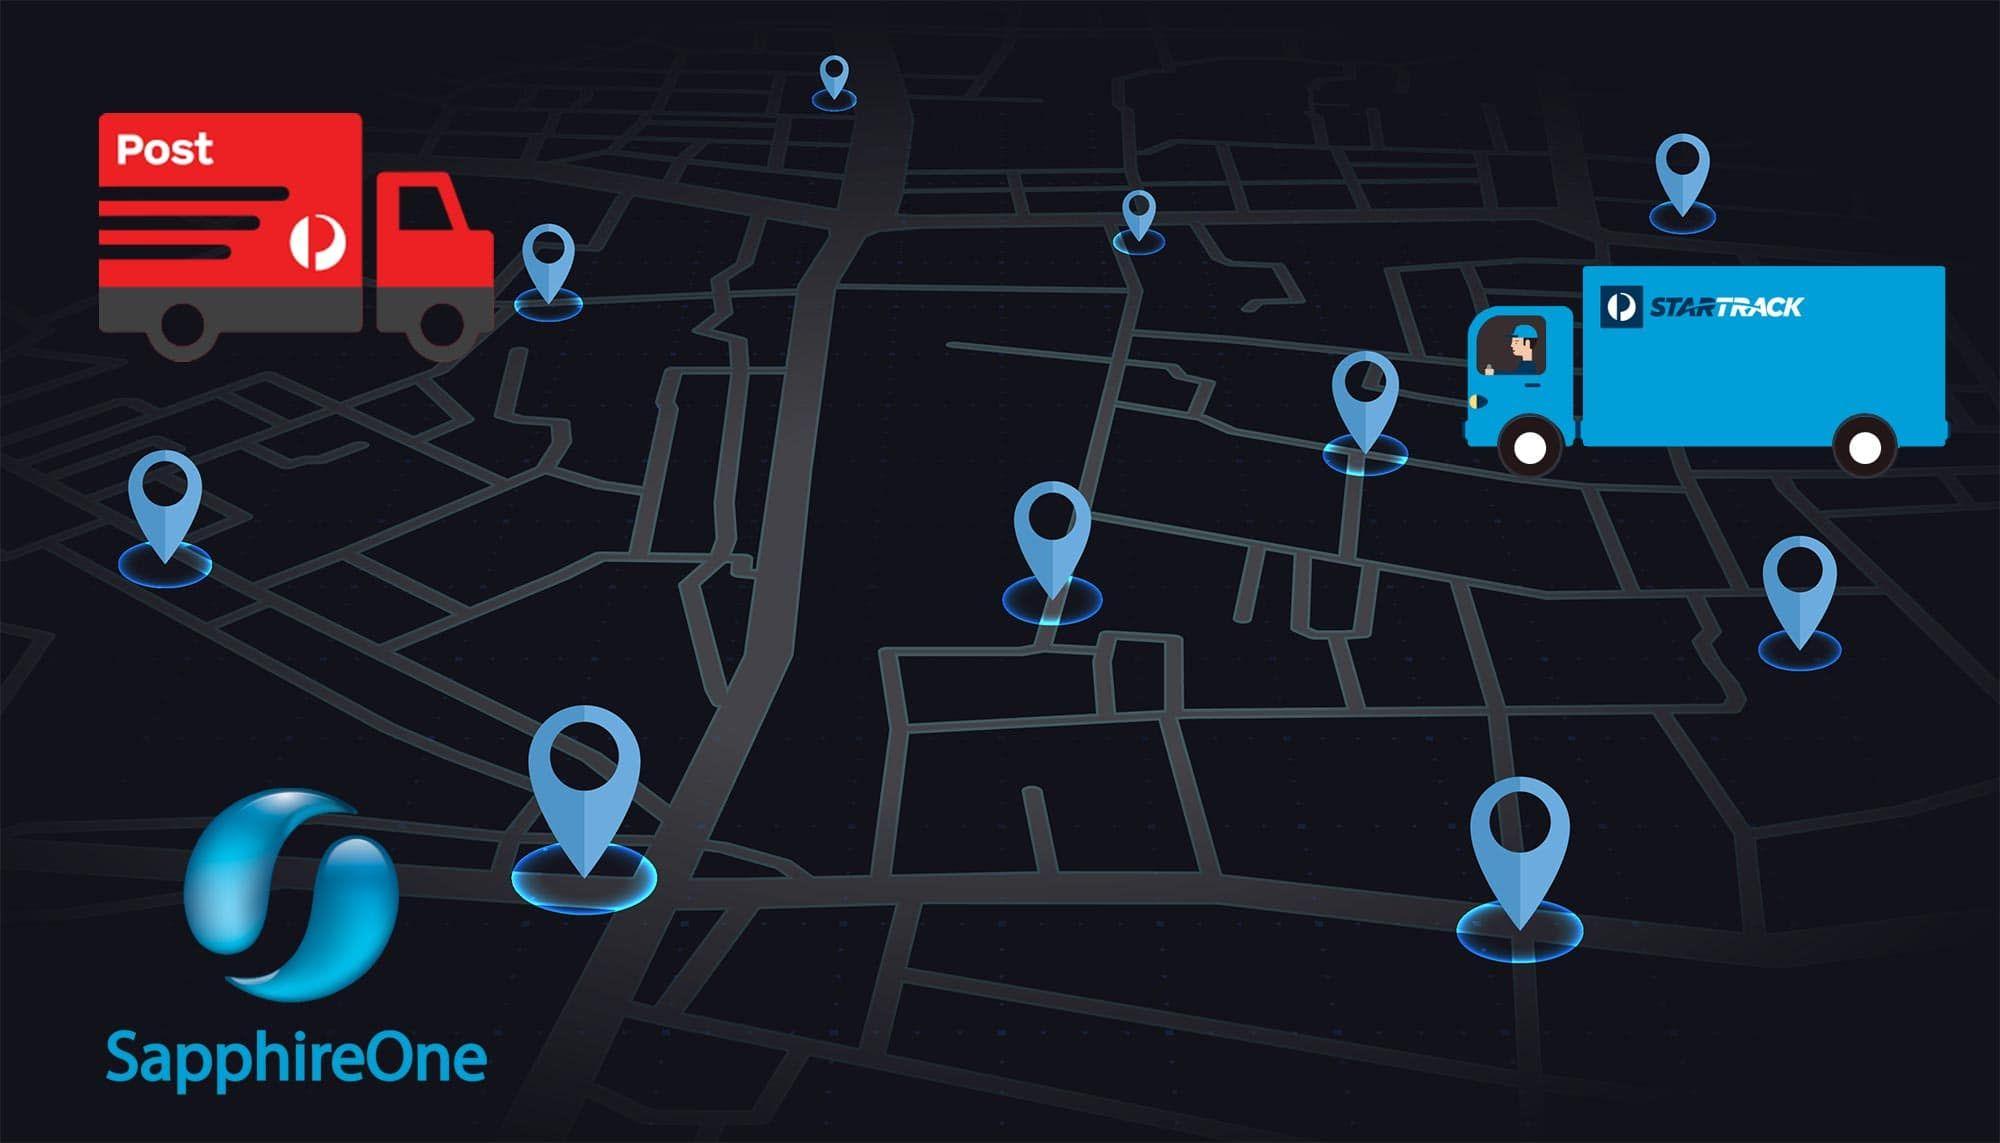 Australia Post API with SapphireOne system transform your